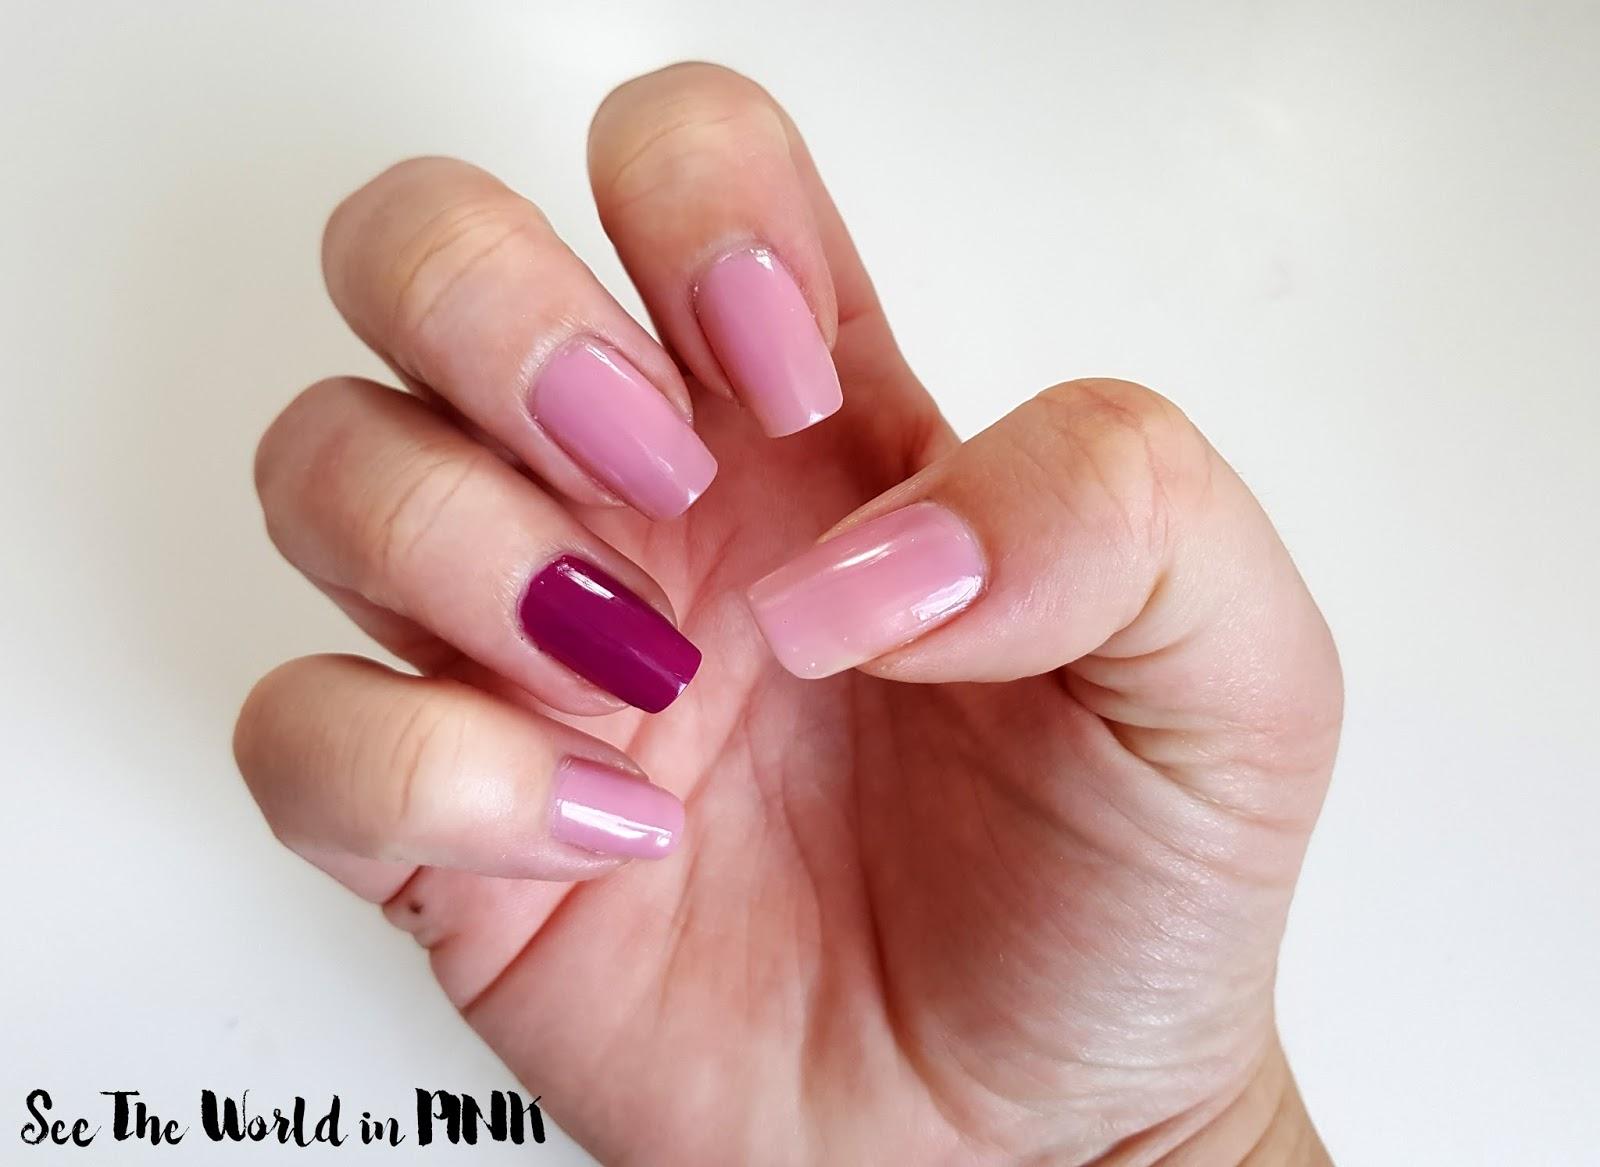 Manicure Tuesday - Mani/Pedi at Esme Beauty & Floral Bar